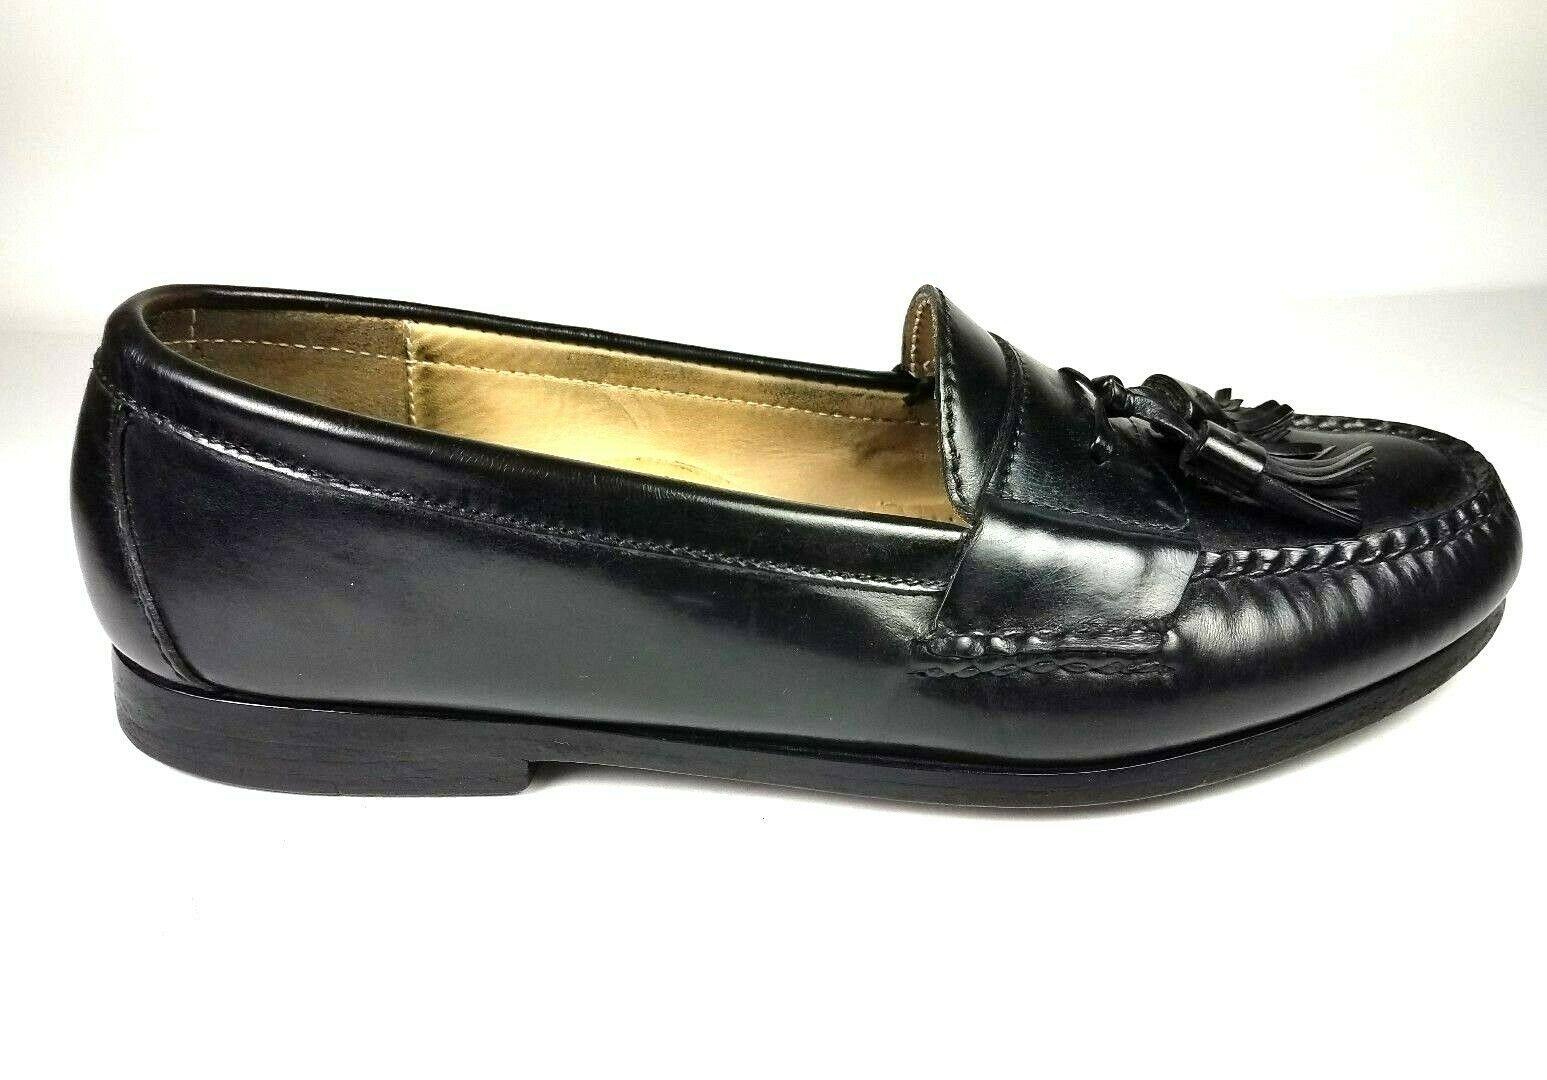 COLE HAAN Men's Loafers 9 D Leather Black Pinch Tassel Slip On Dress Shoes